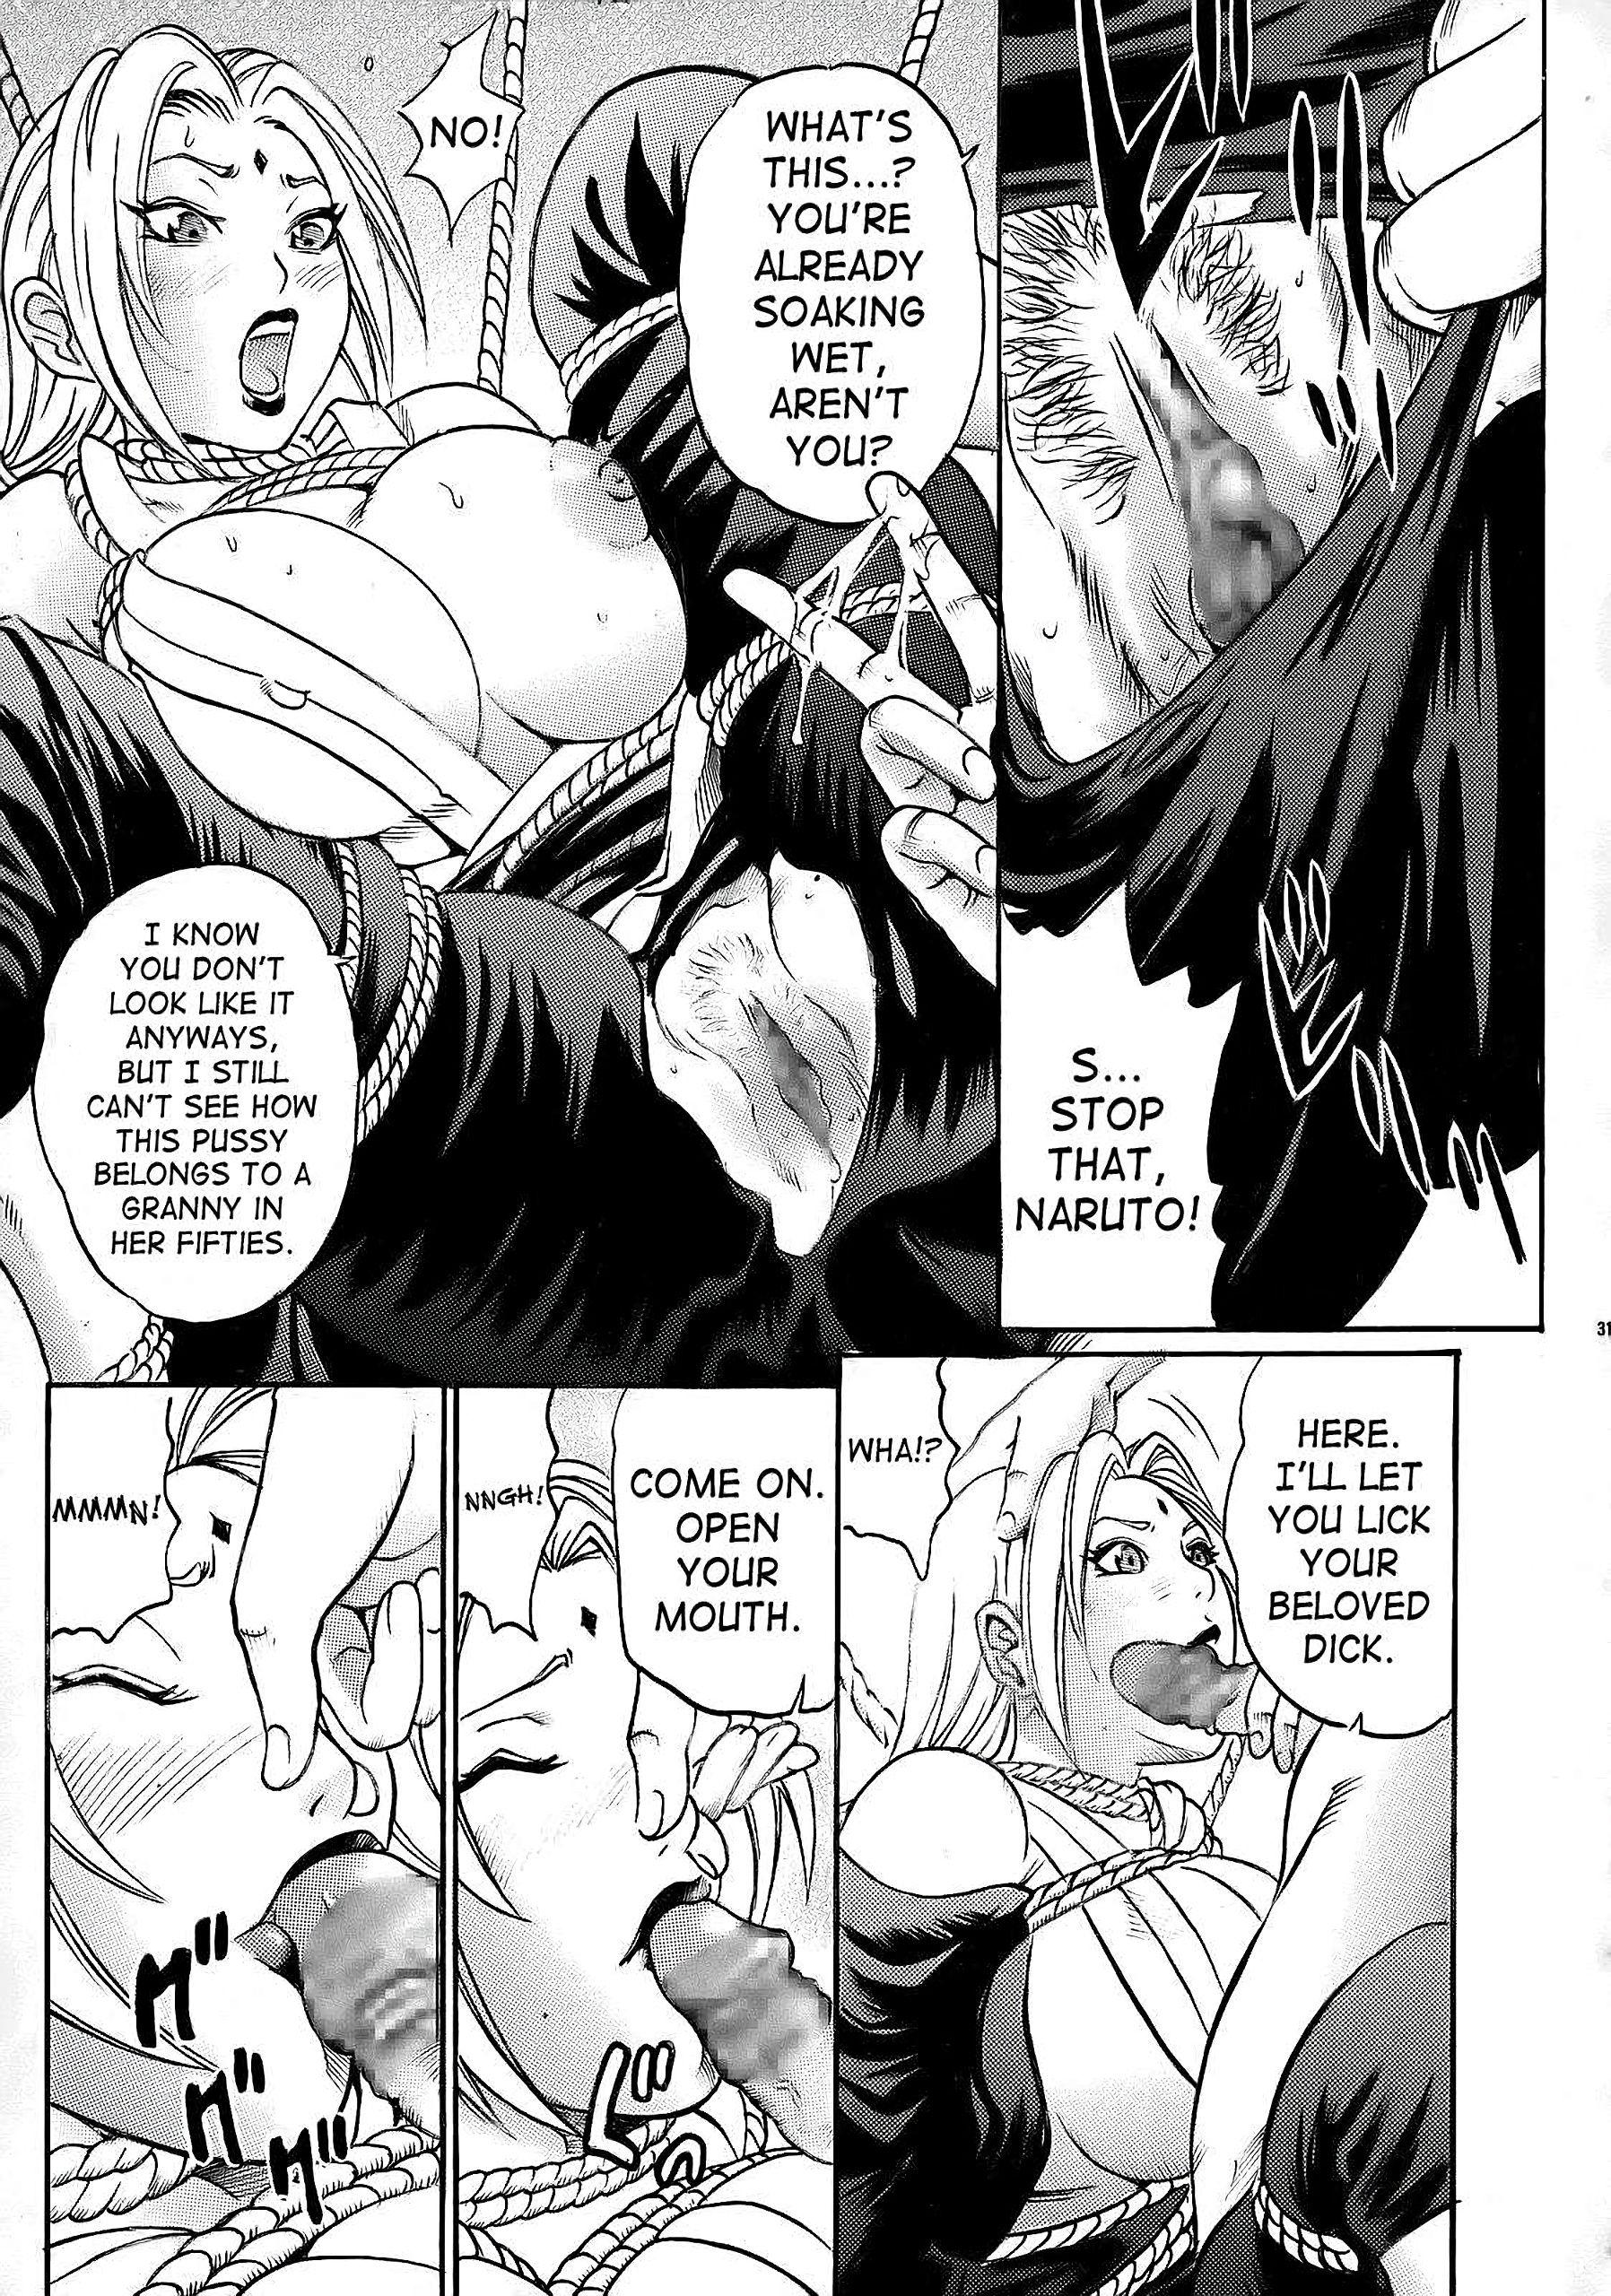 Pm 10 indecent ninja training hentai manga picture 28